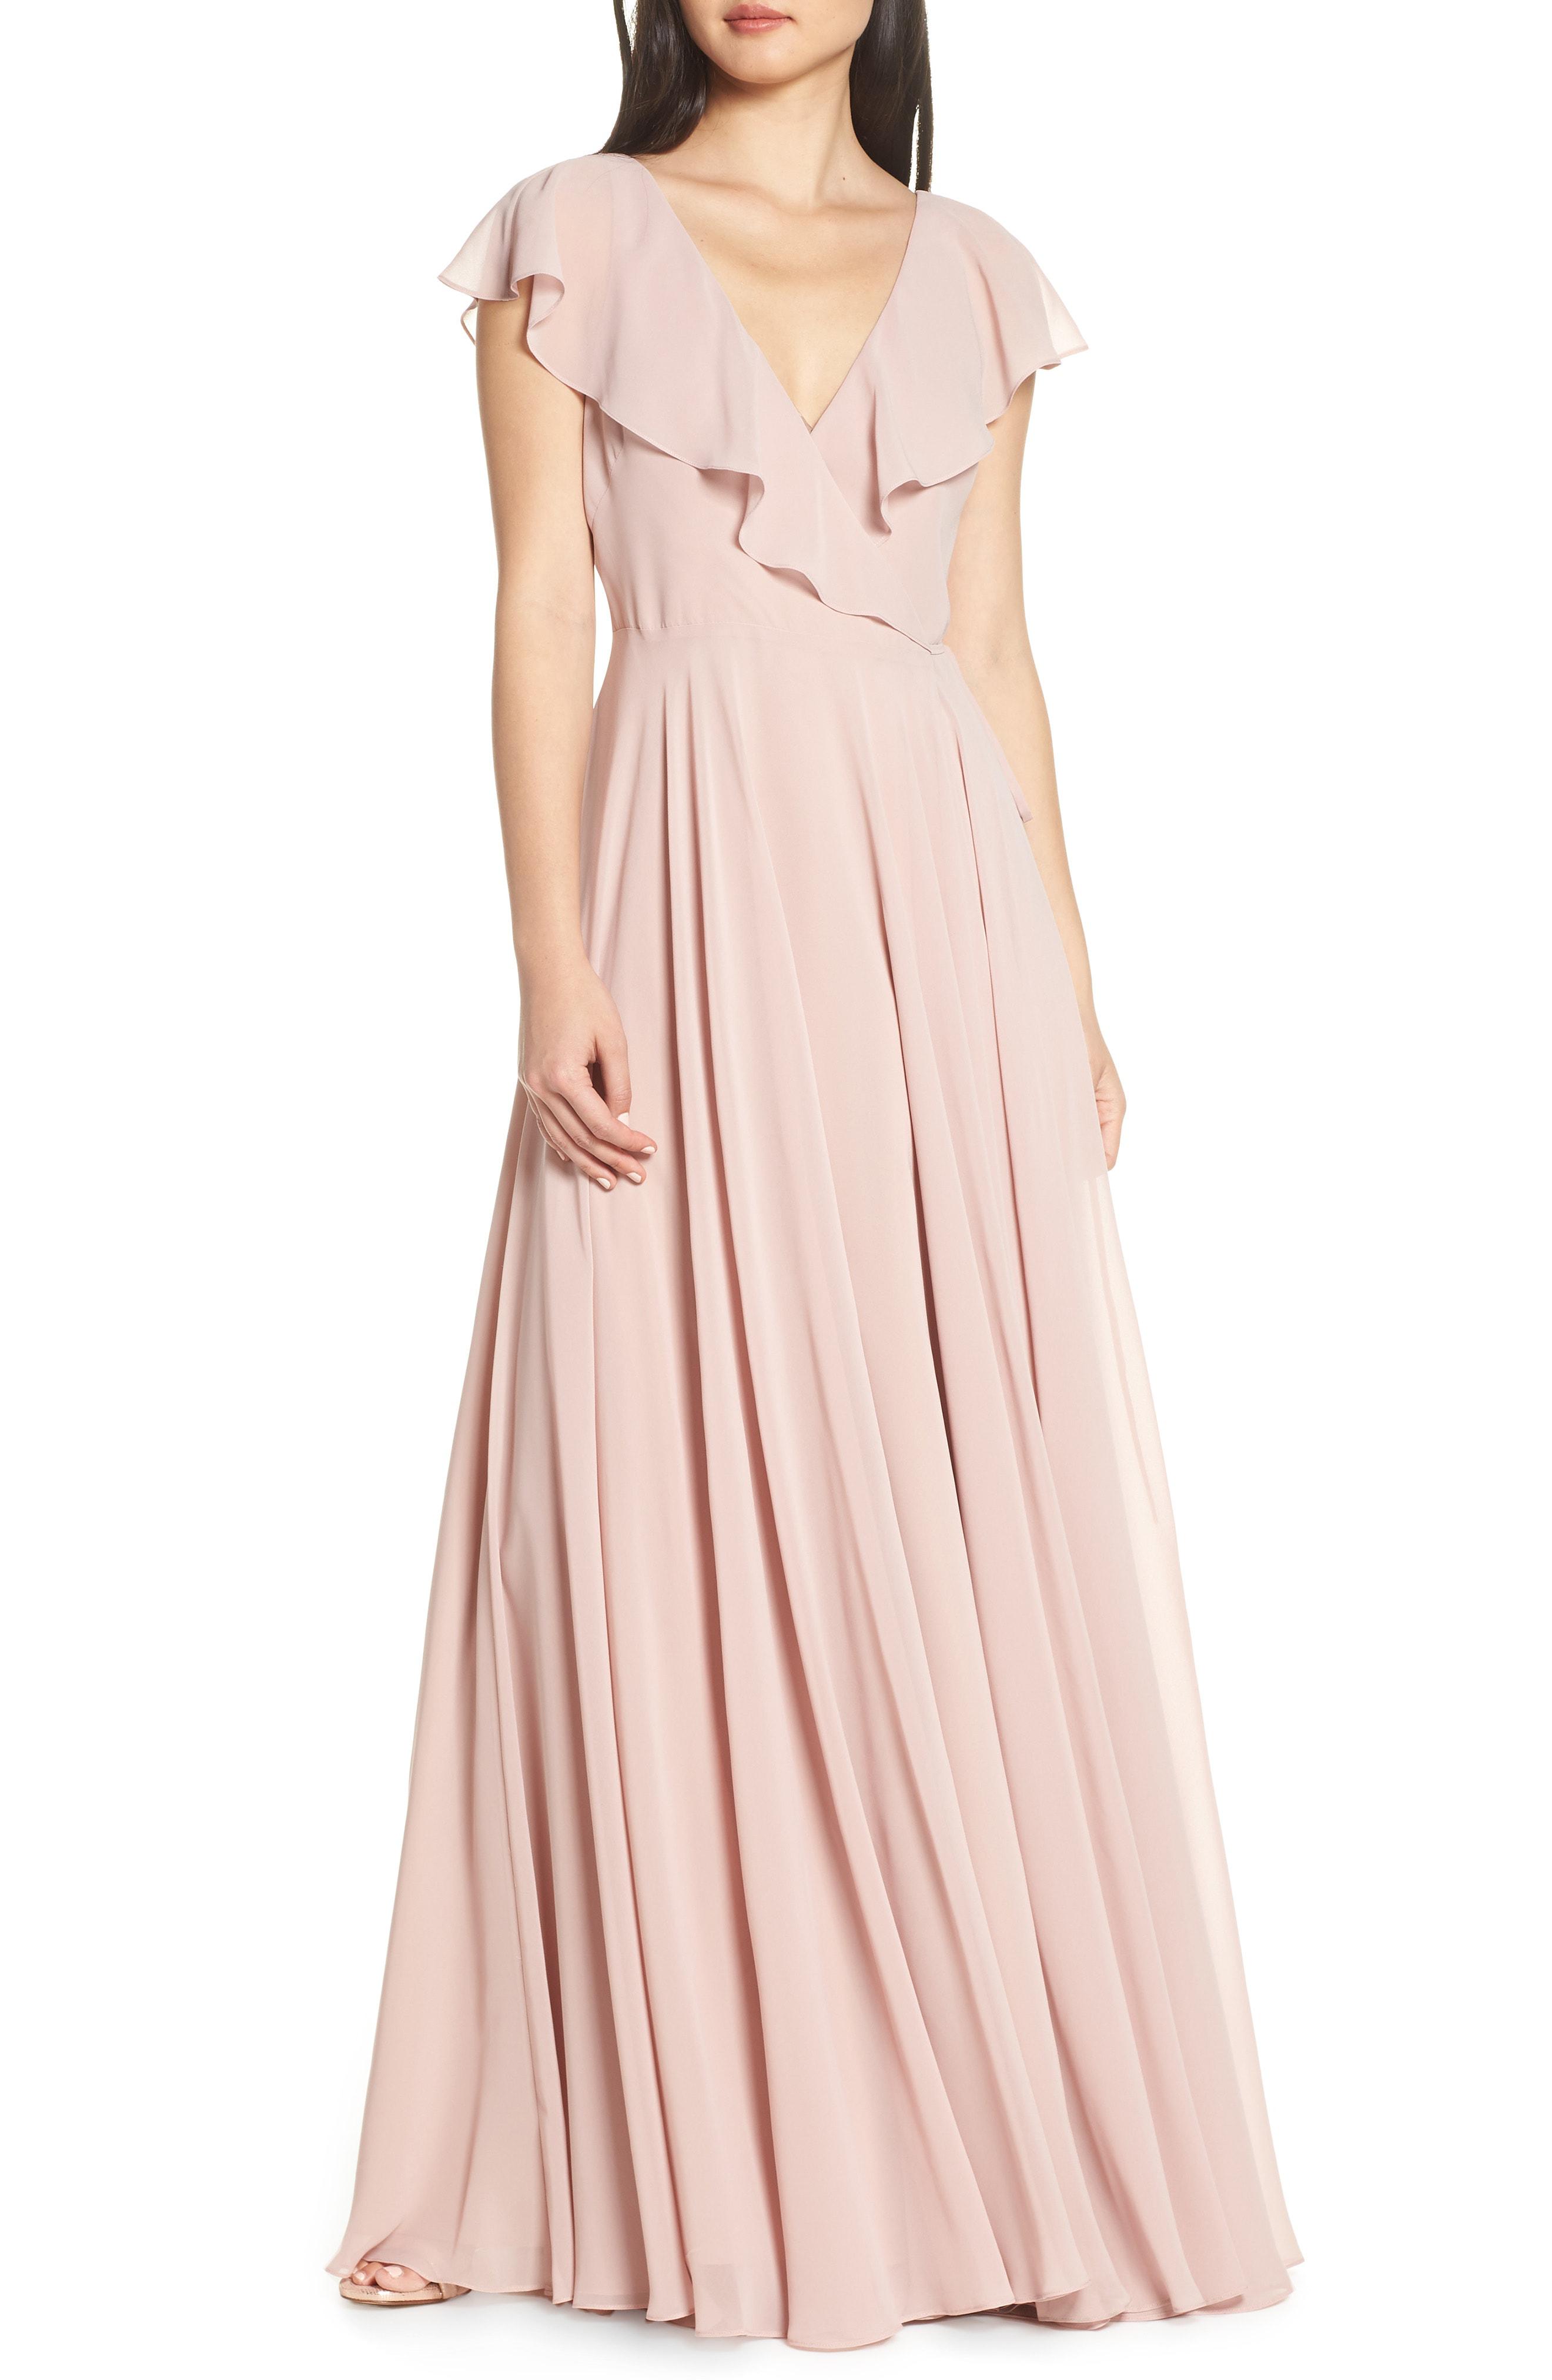 acaca196d9d09 Jenny Yoo Faye Ruffle Wrap Chiffon Evening Dress In Whipped Apricot ...